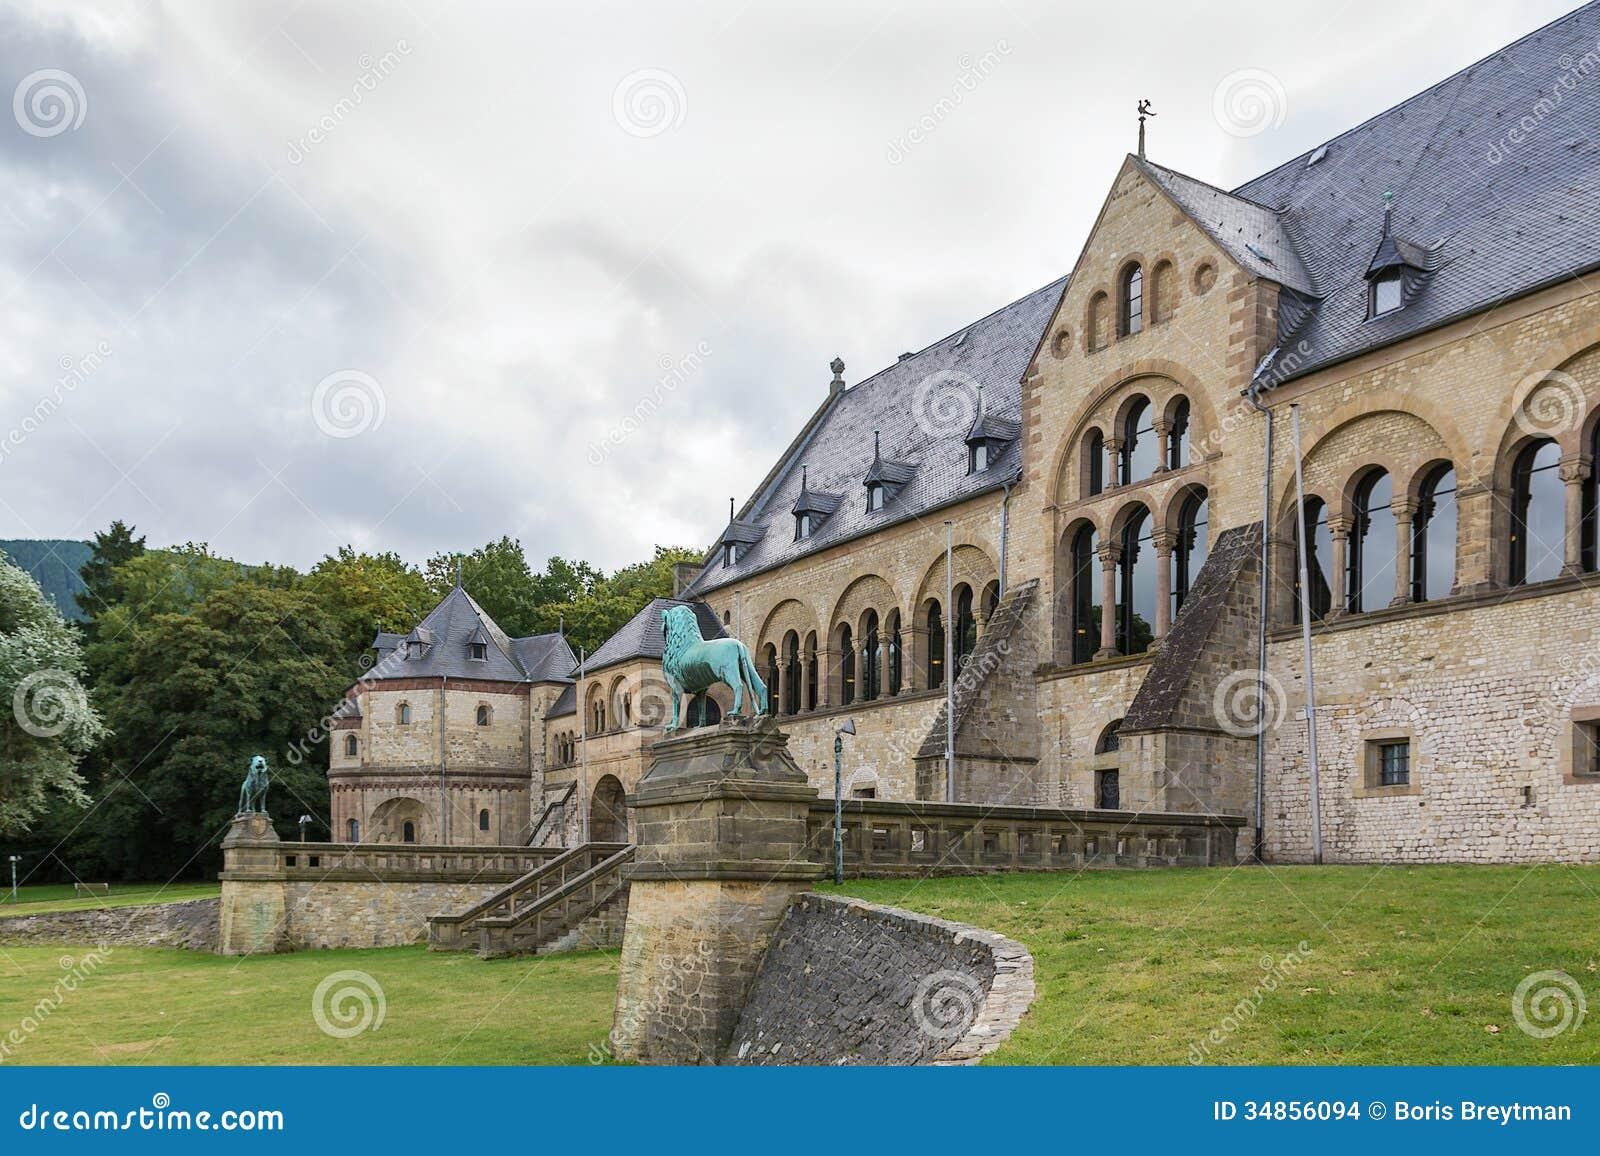 Goslar Germany  city photos : Mediaeval Imperial Palace In Goslar, Germany Stock Images Image ...